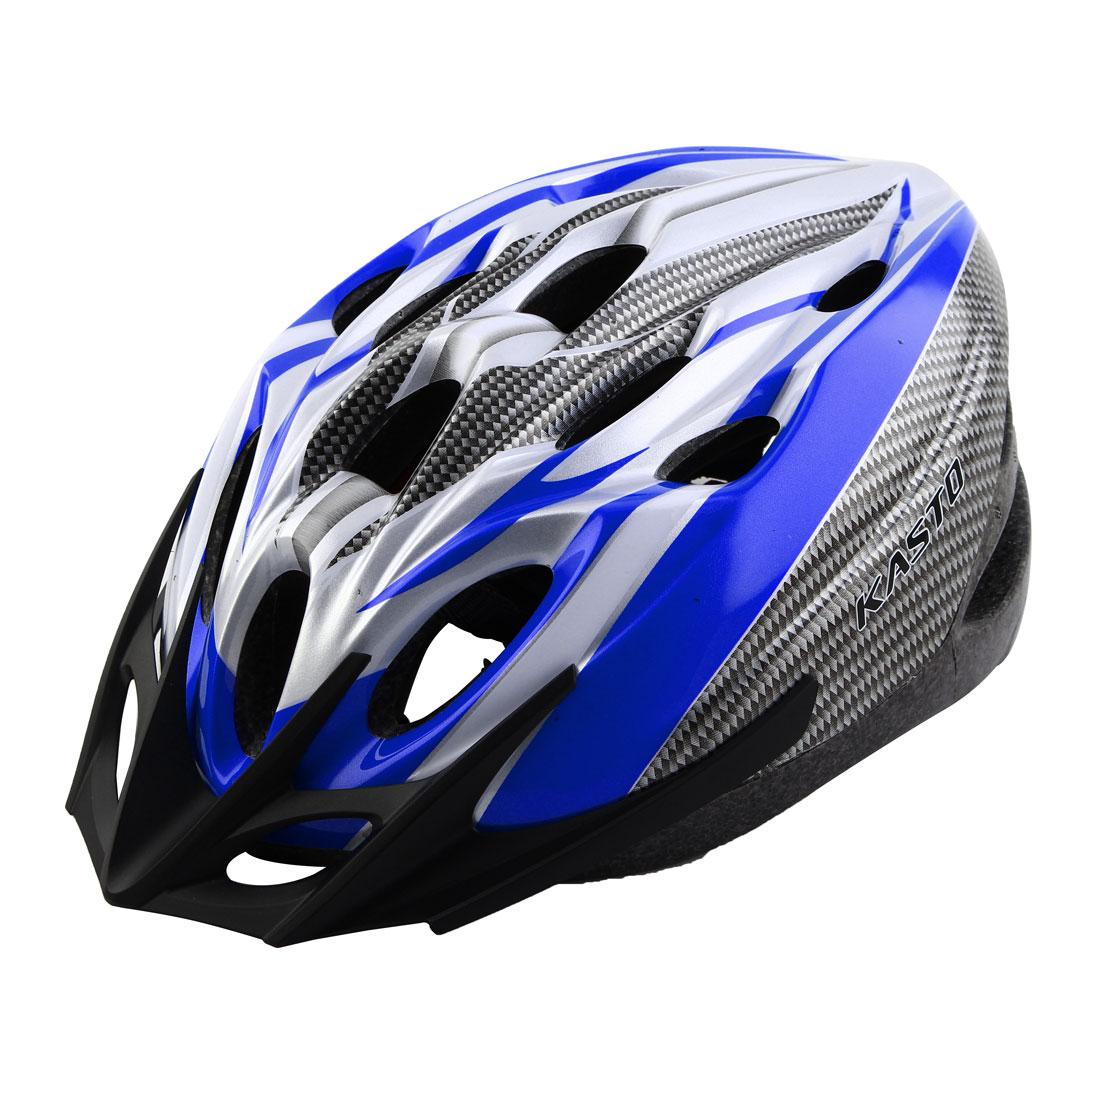 18 Holes Removable Visor Outdoor Sports Cap Portable Hat Adjustable Cycling Biking Helmet Sapphire Blue